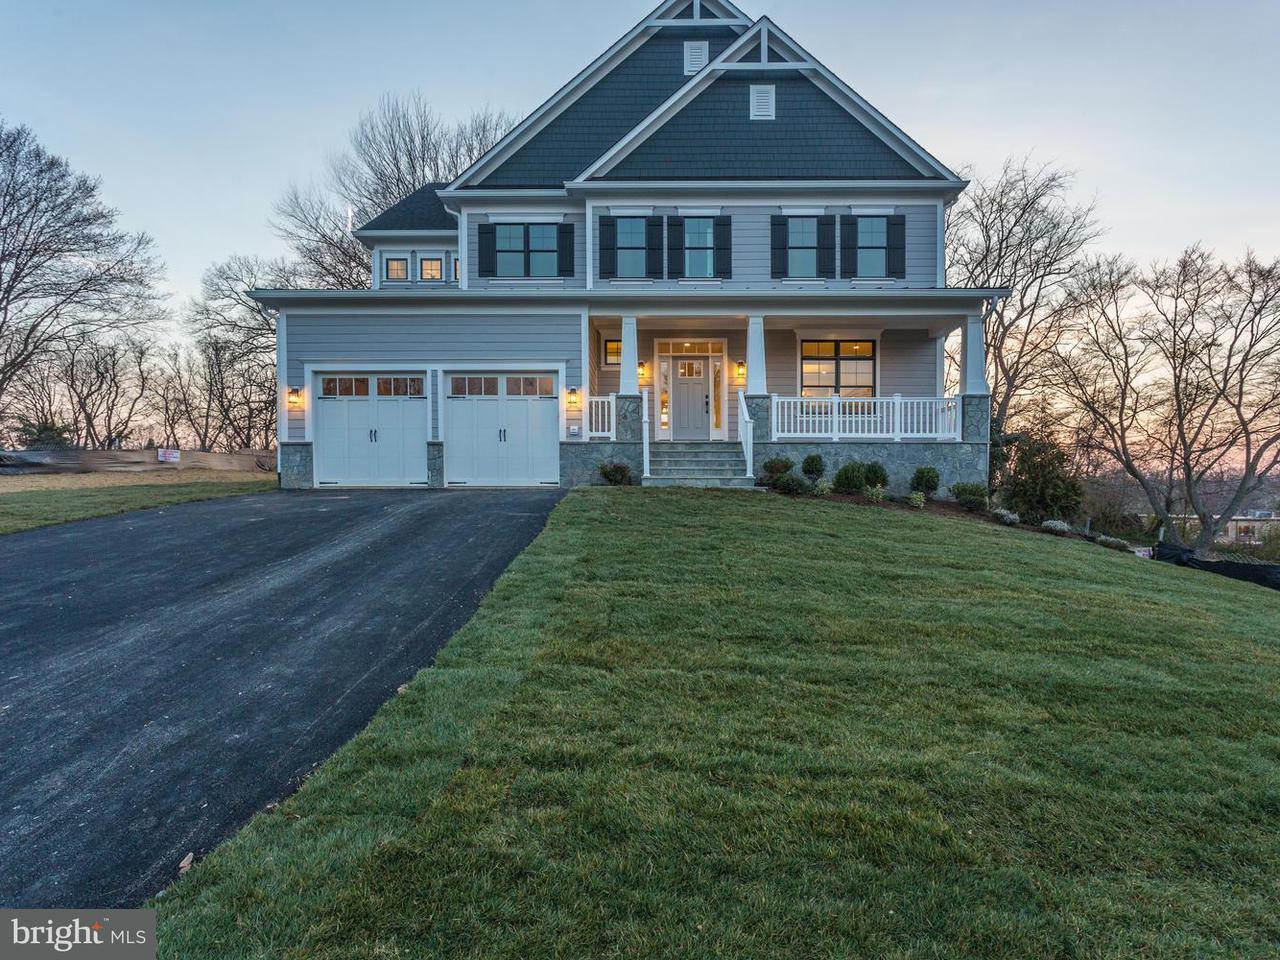 Single Family Home for Sale at 2998 BEECHWOOD Lane 2998 BEECHWOOD Lane Falls Church, Virginia 22042 United States